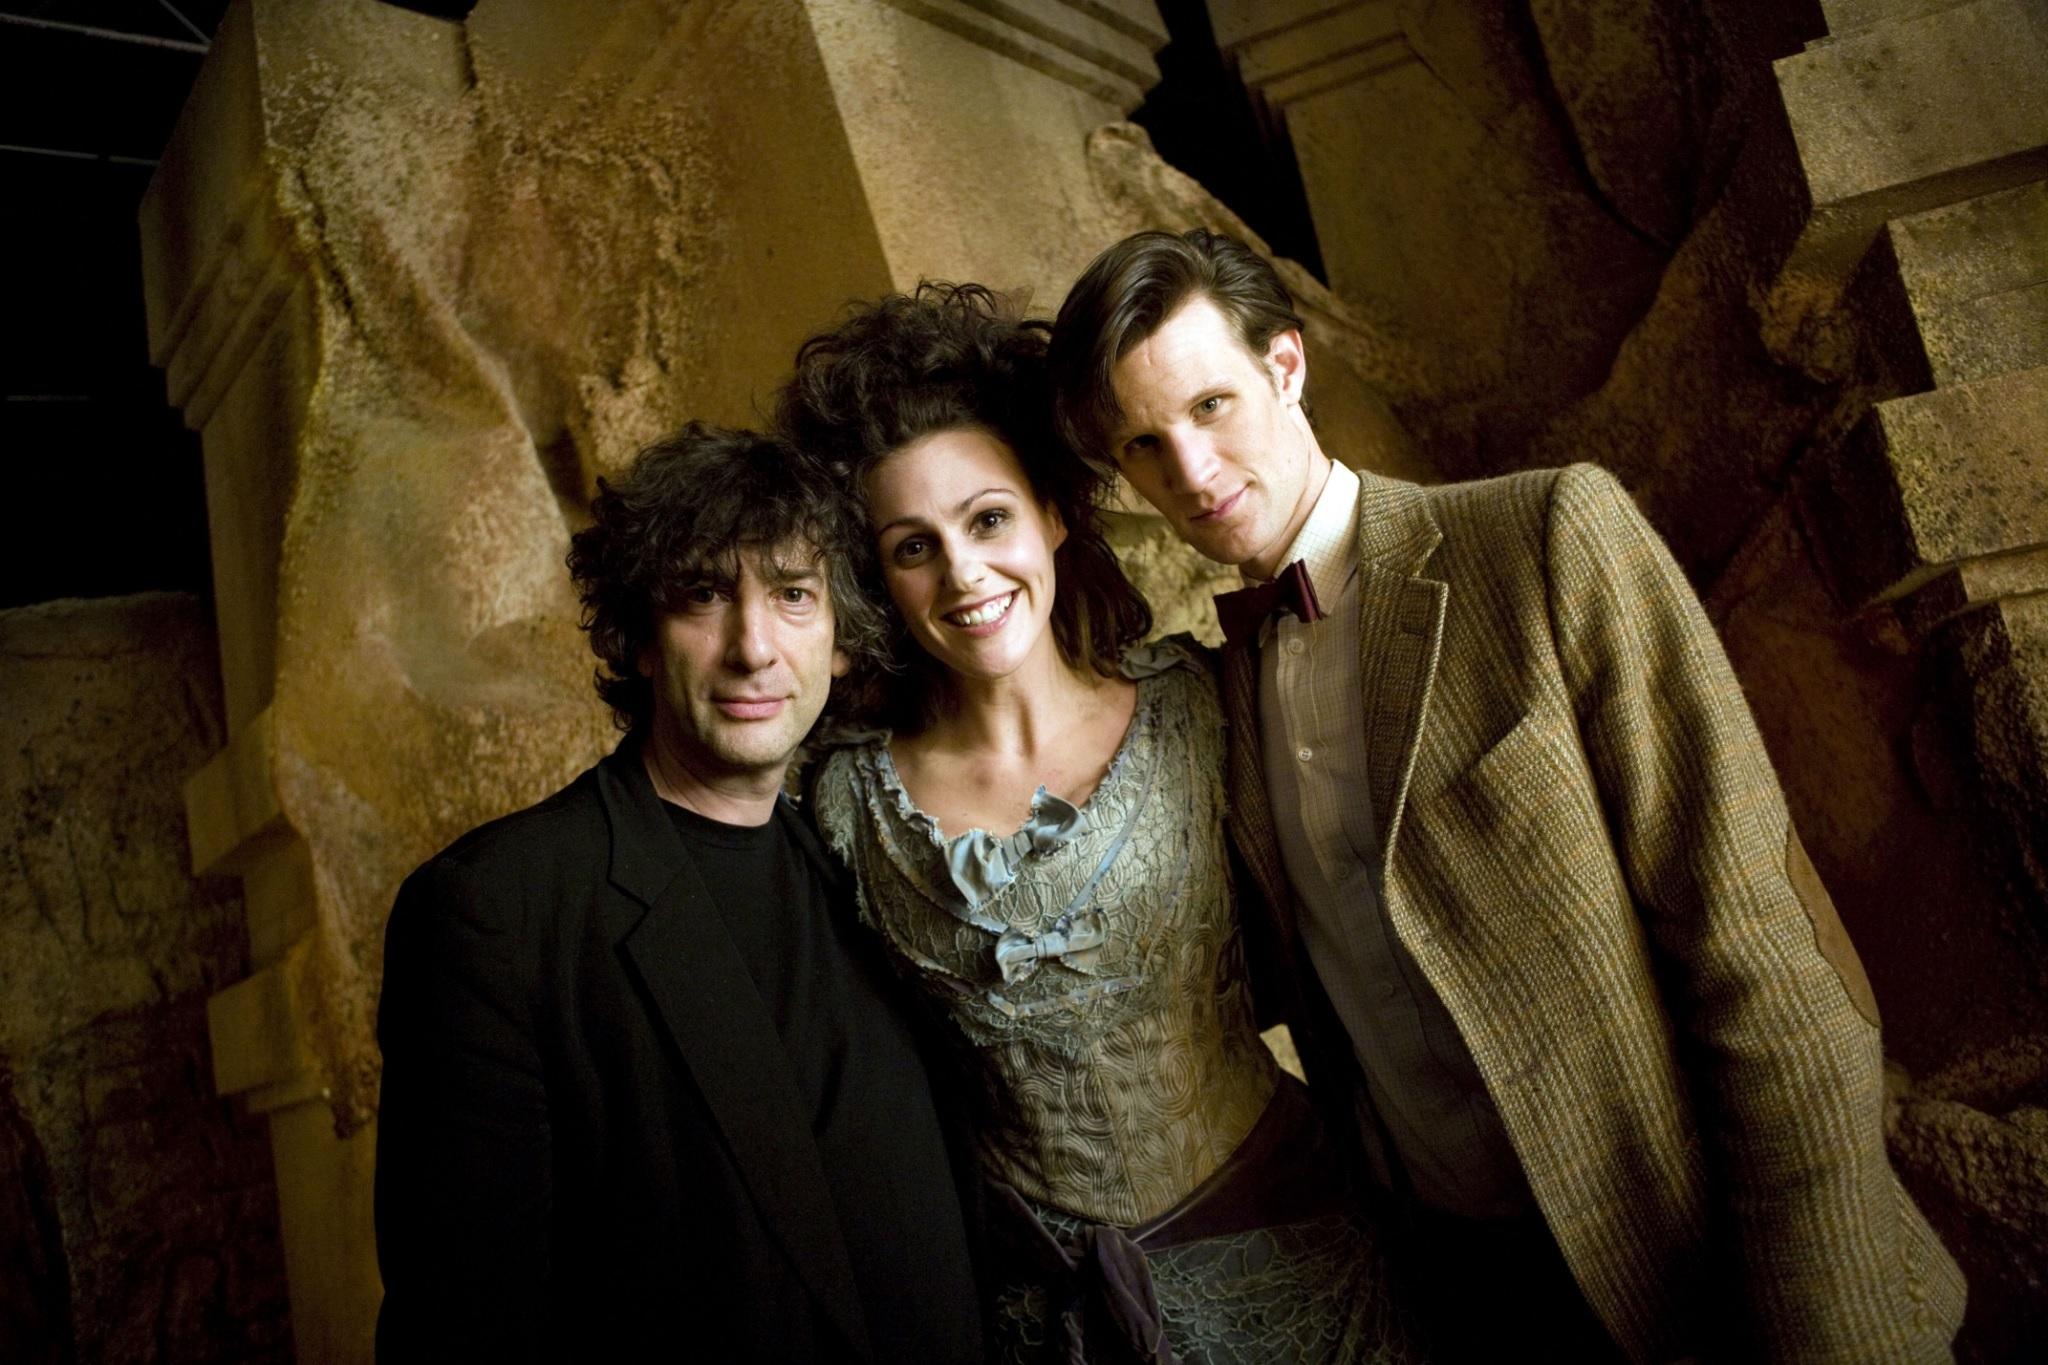 Neil Gaiman to Reveal The Doctor's Wife Secrets in Next Watch-Along